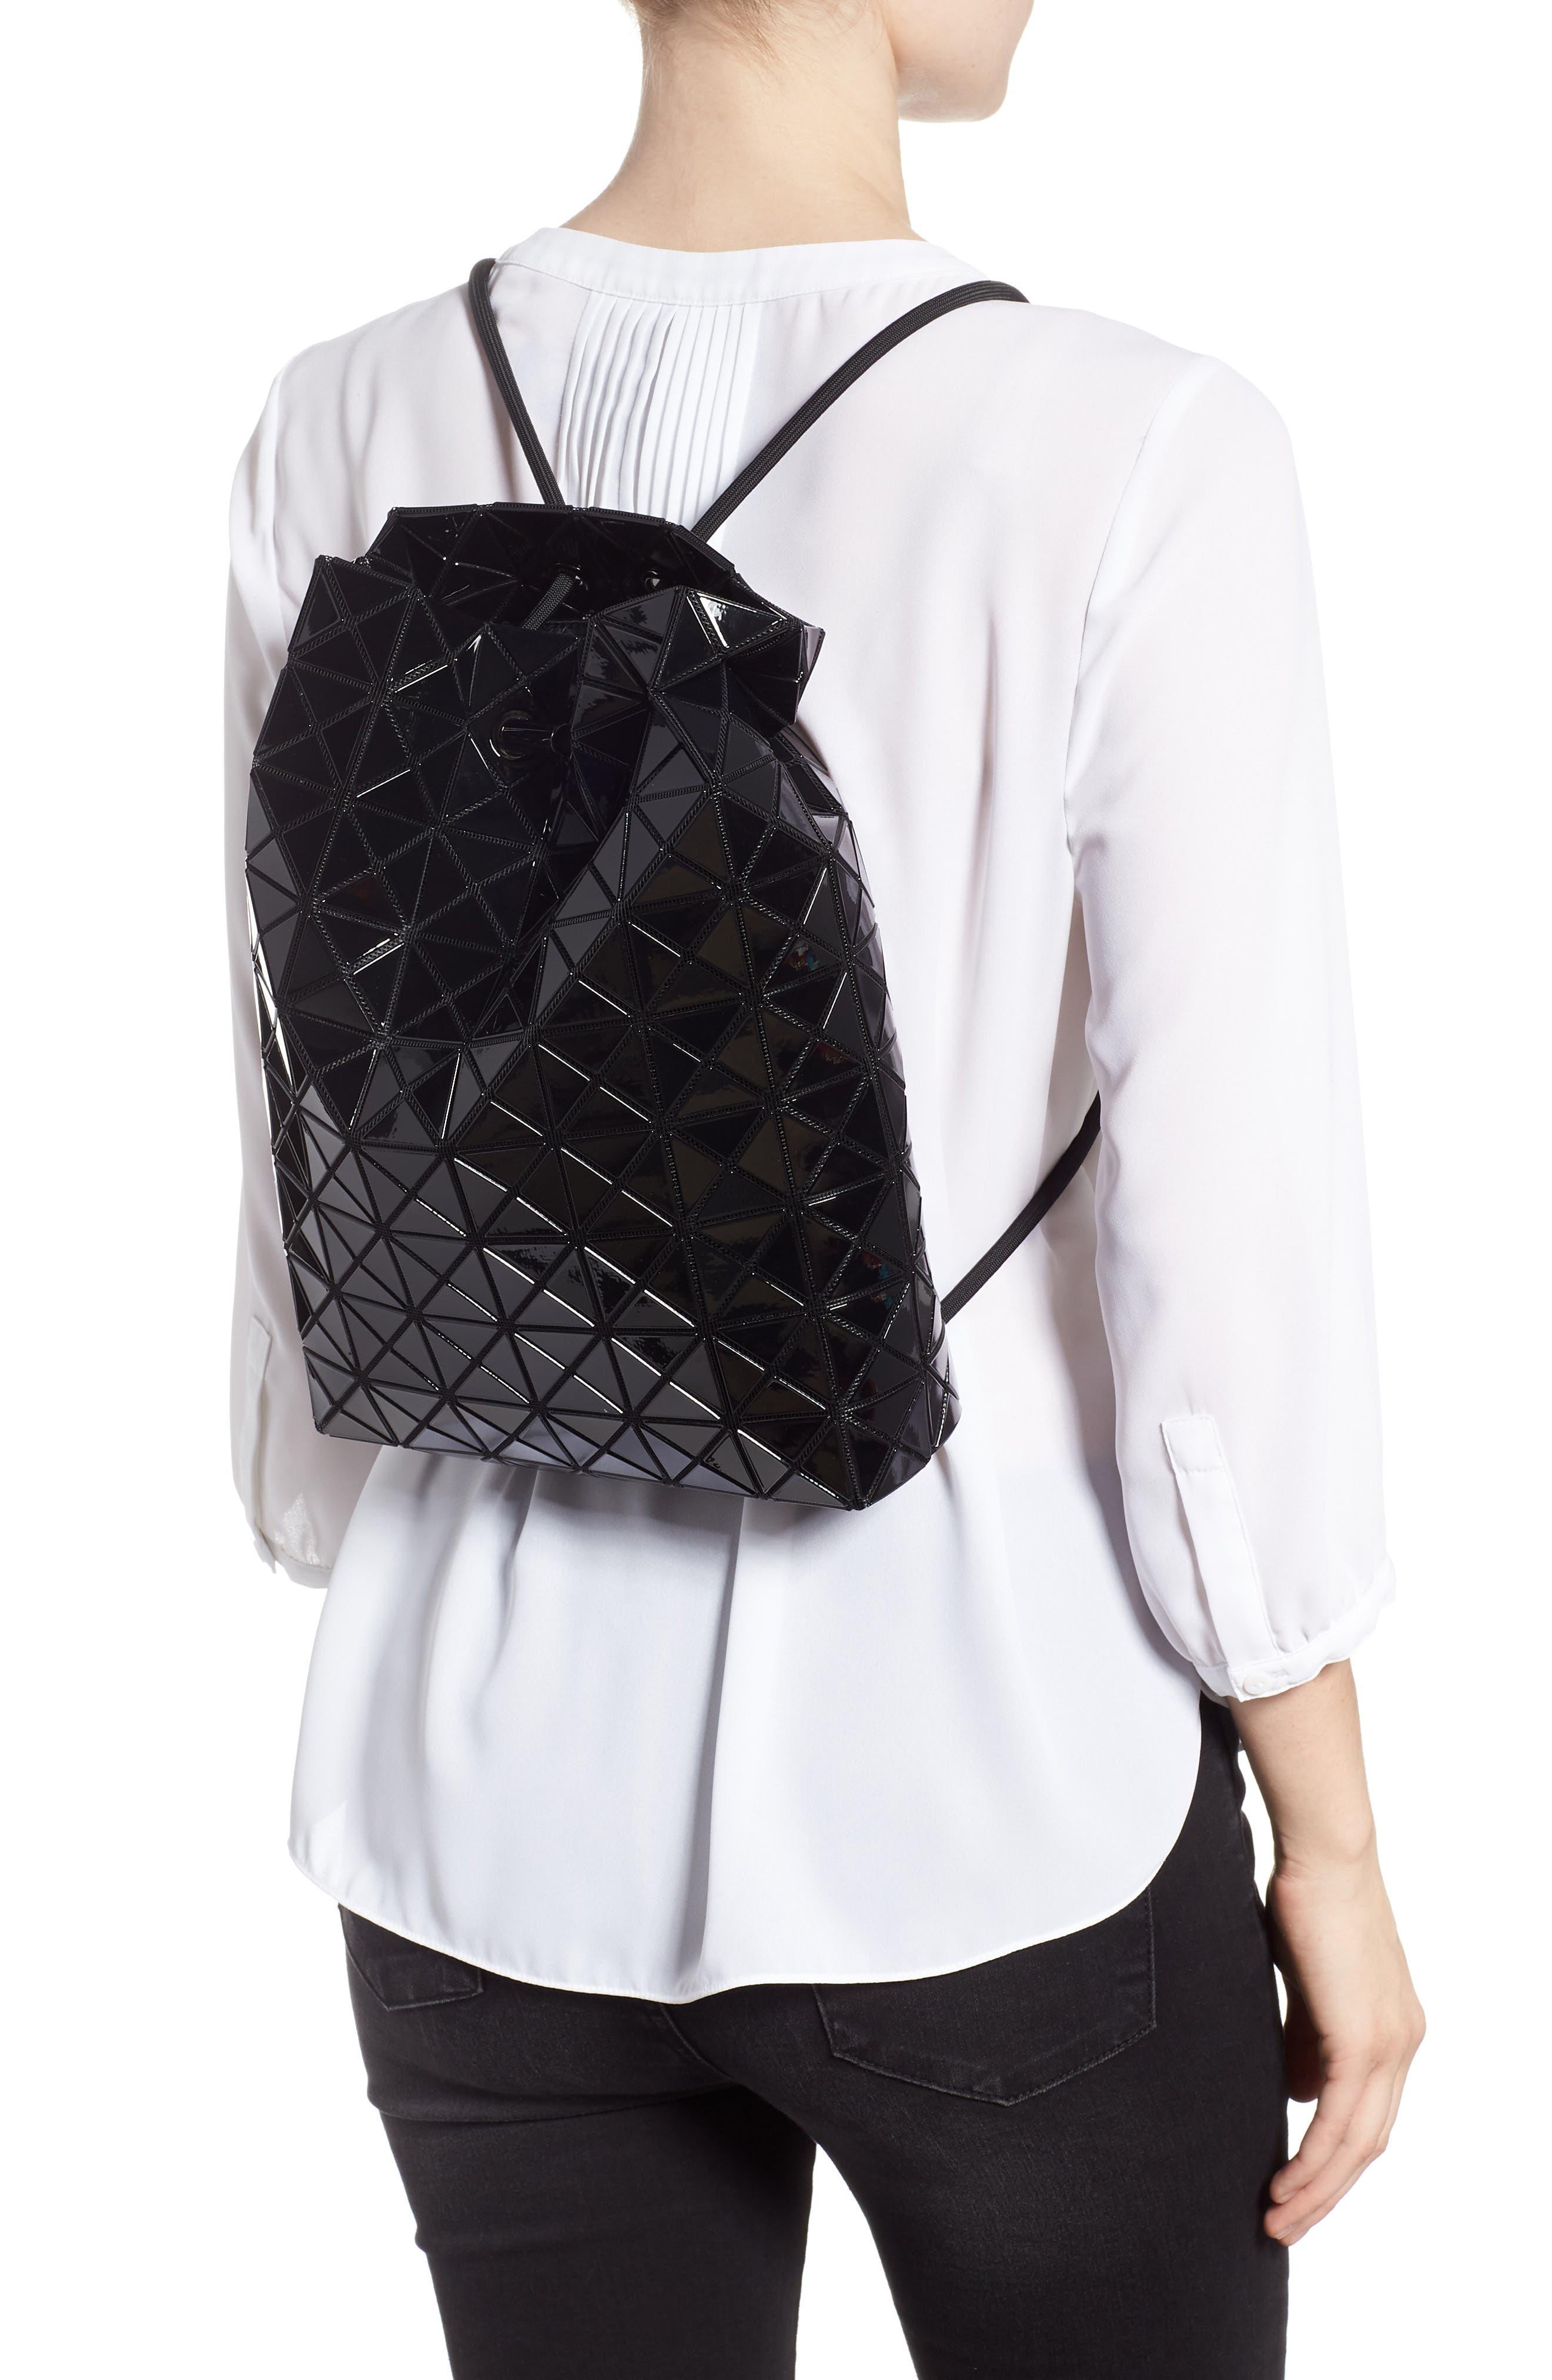 BAO BAO ISSEY MIYAKE, Wring Flat Backpack, Alternate thumbnail 2, color, BLACK